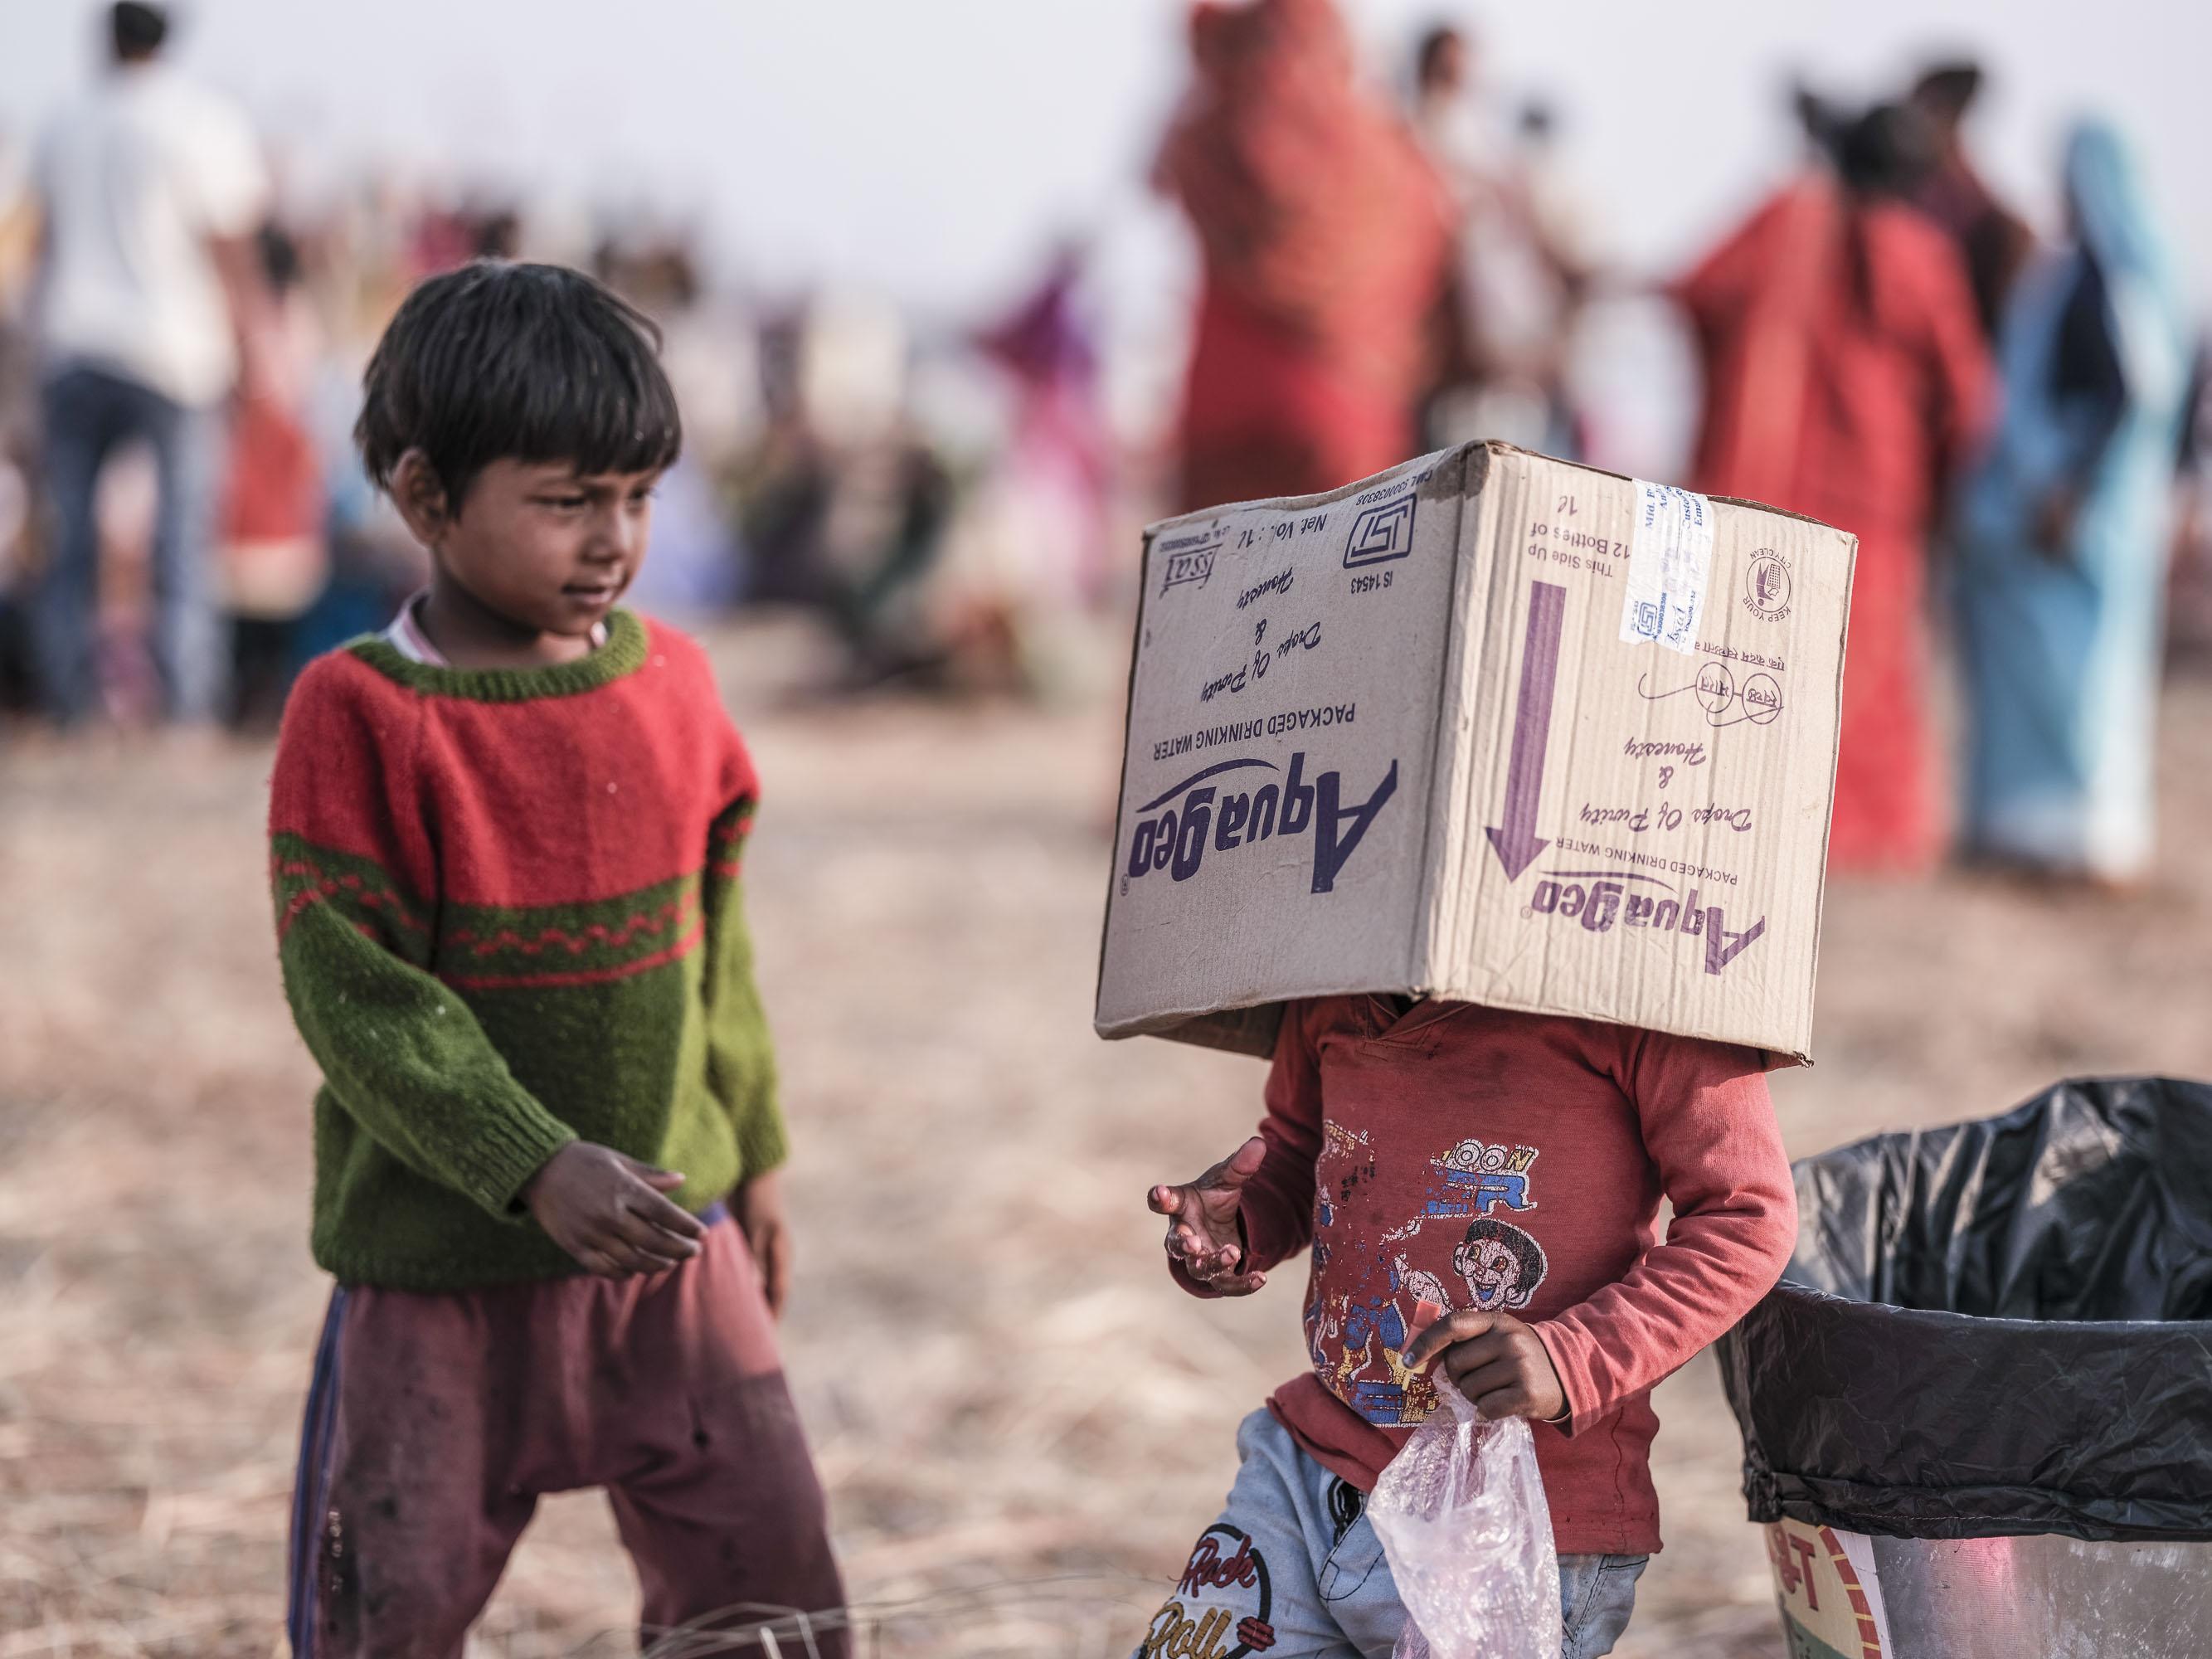 kids playing in the camp with a carton box pilgrims Kumbh mela 2019 India Allahabad Prayagraj Ardh hindu religious Festival event rivers photographer jose jeuland photography